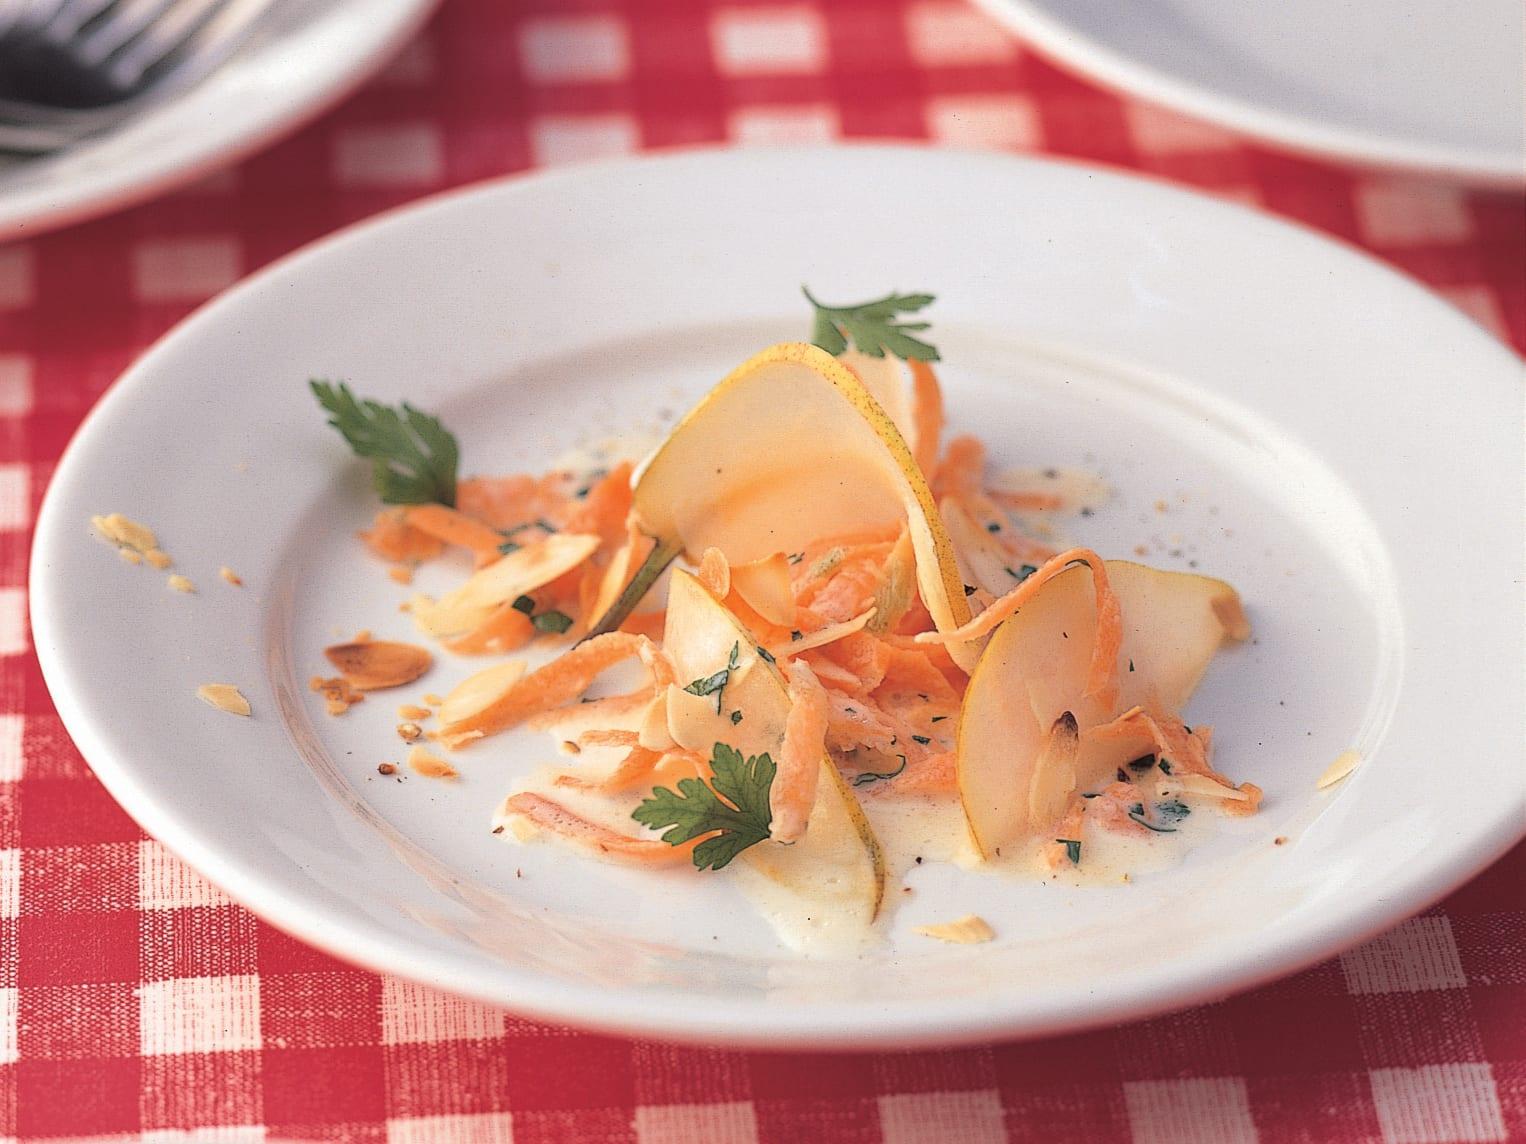 Rüebli-Birnen-Salat mit gerösteten Mandeln